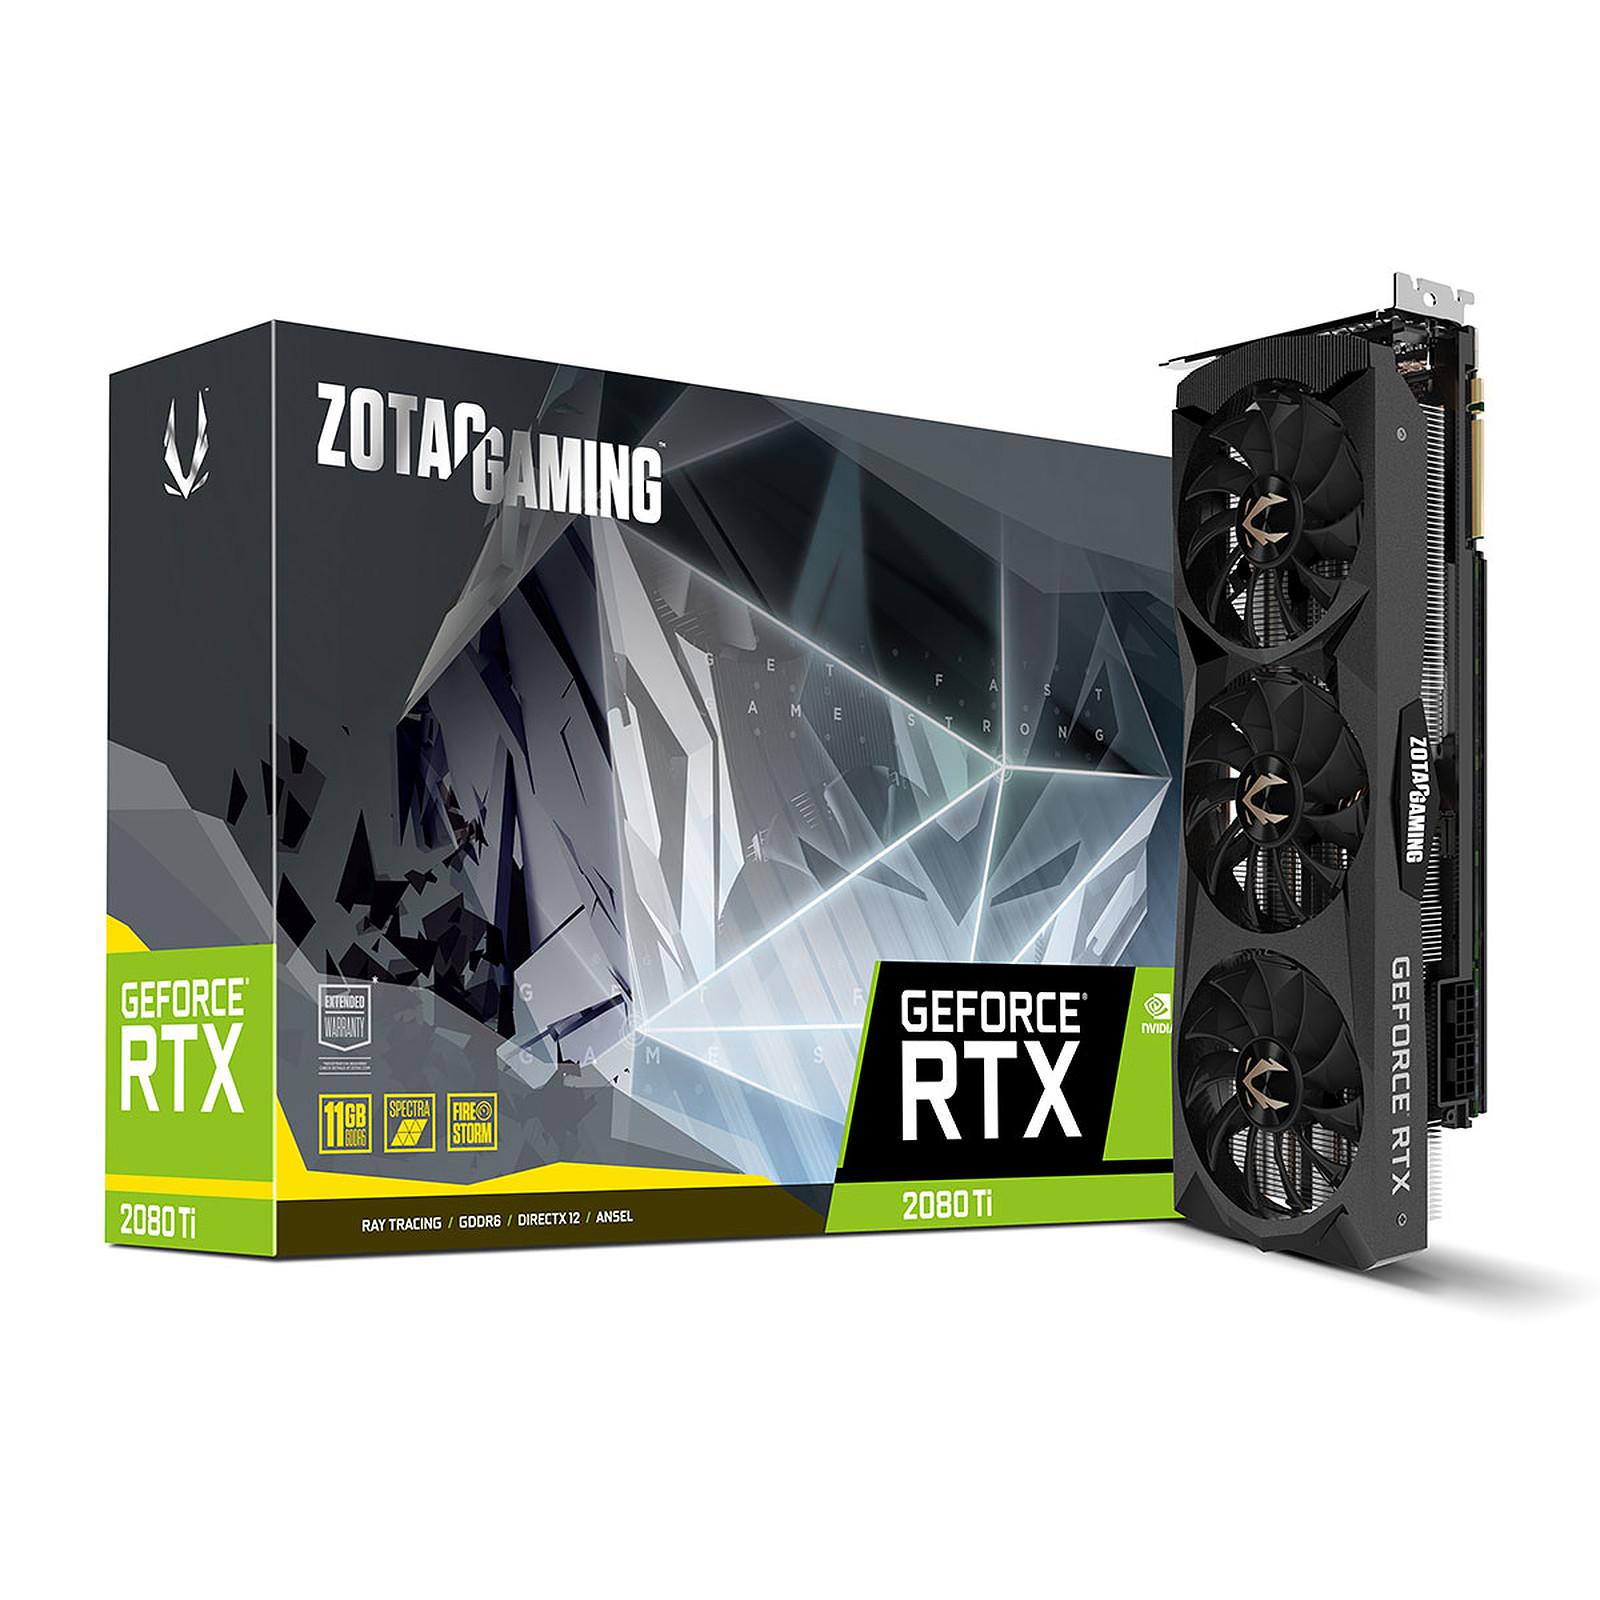 ZOTAC GeForce RTX 2080 Ti 11GB